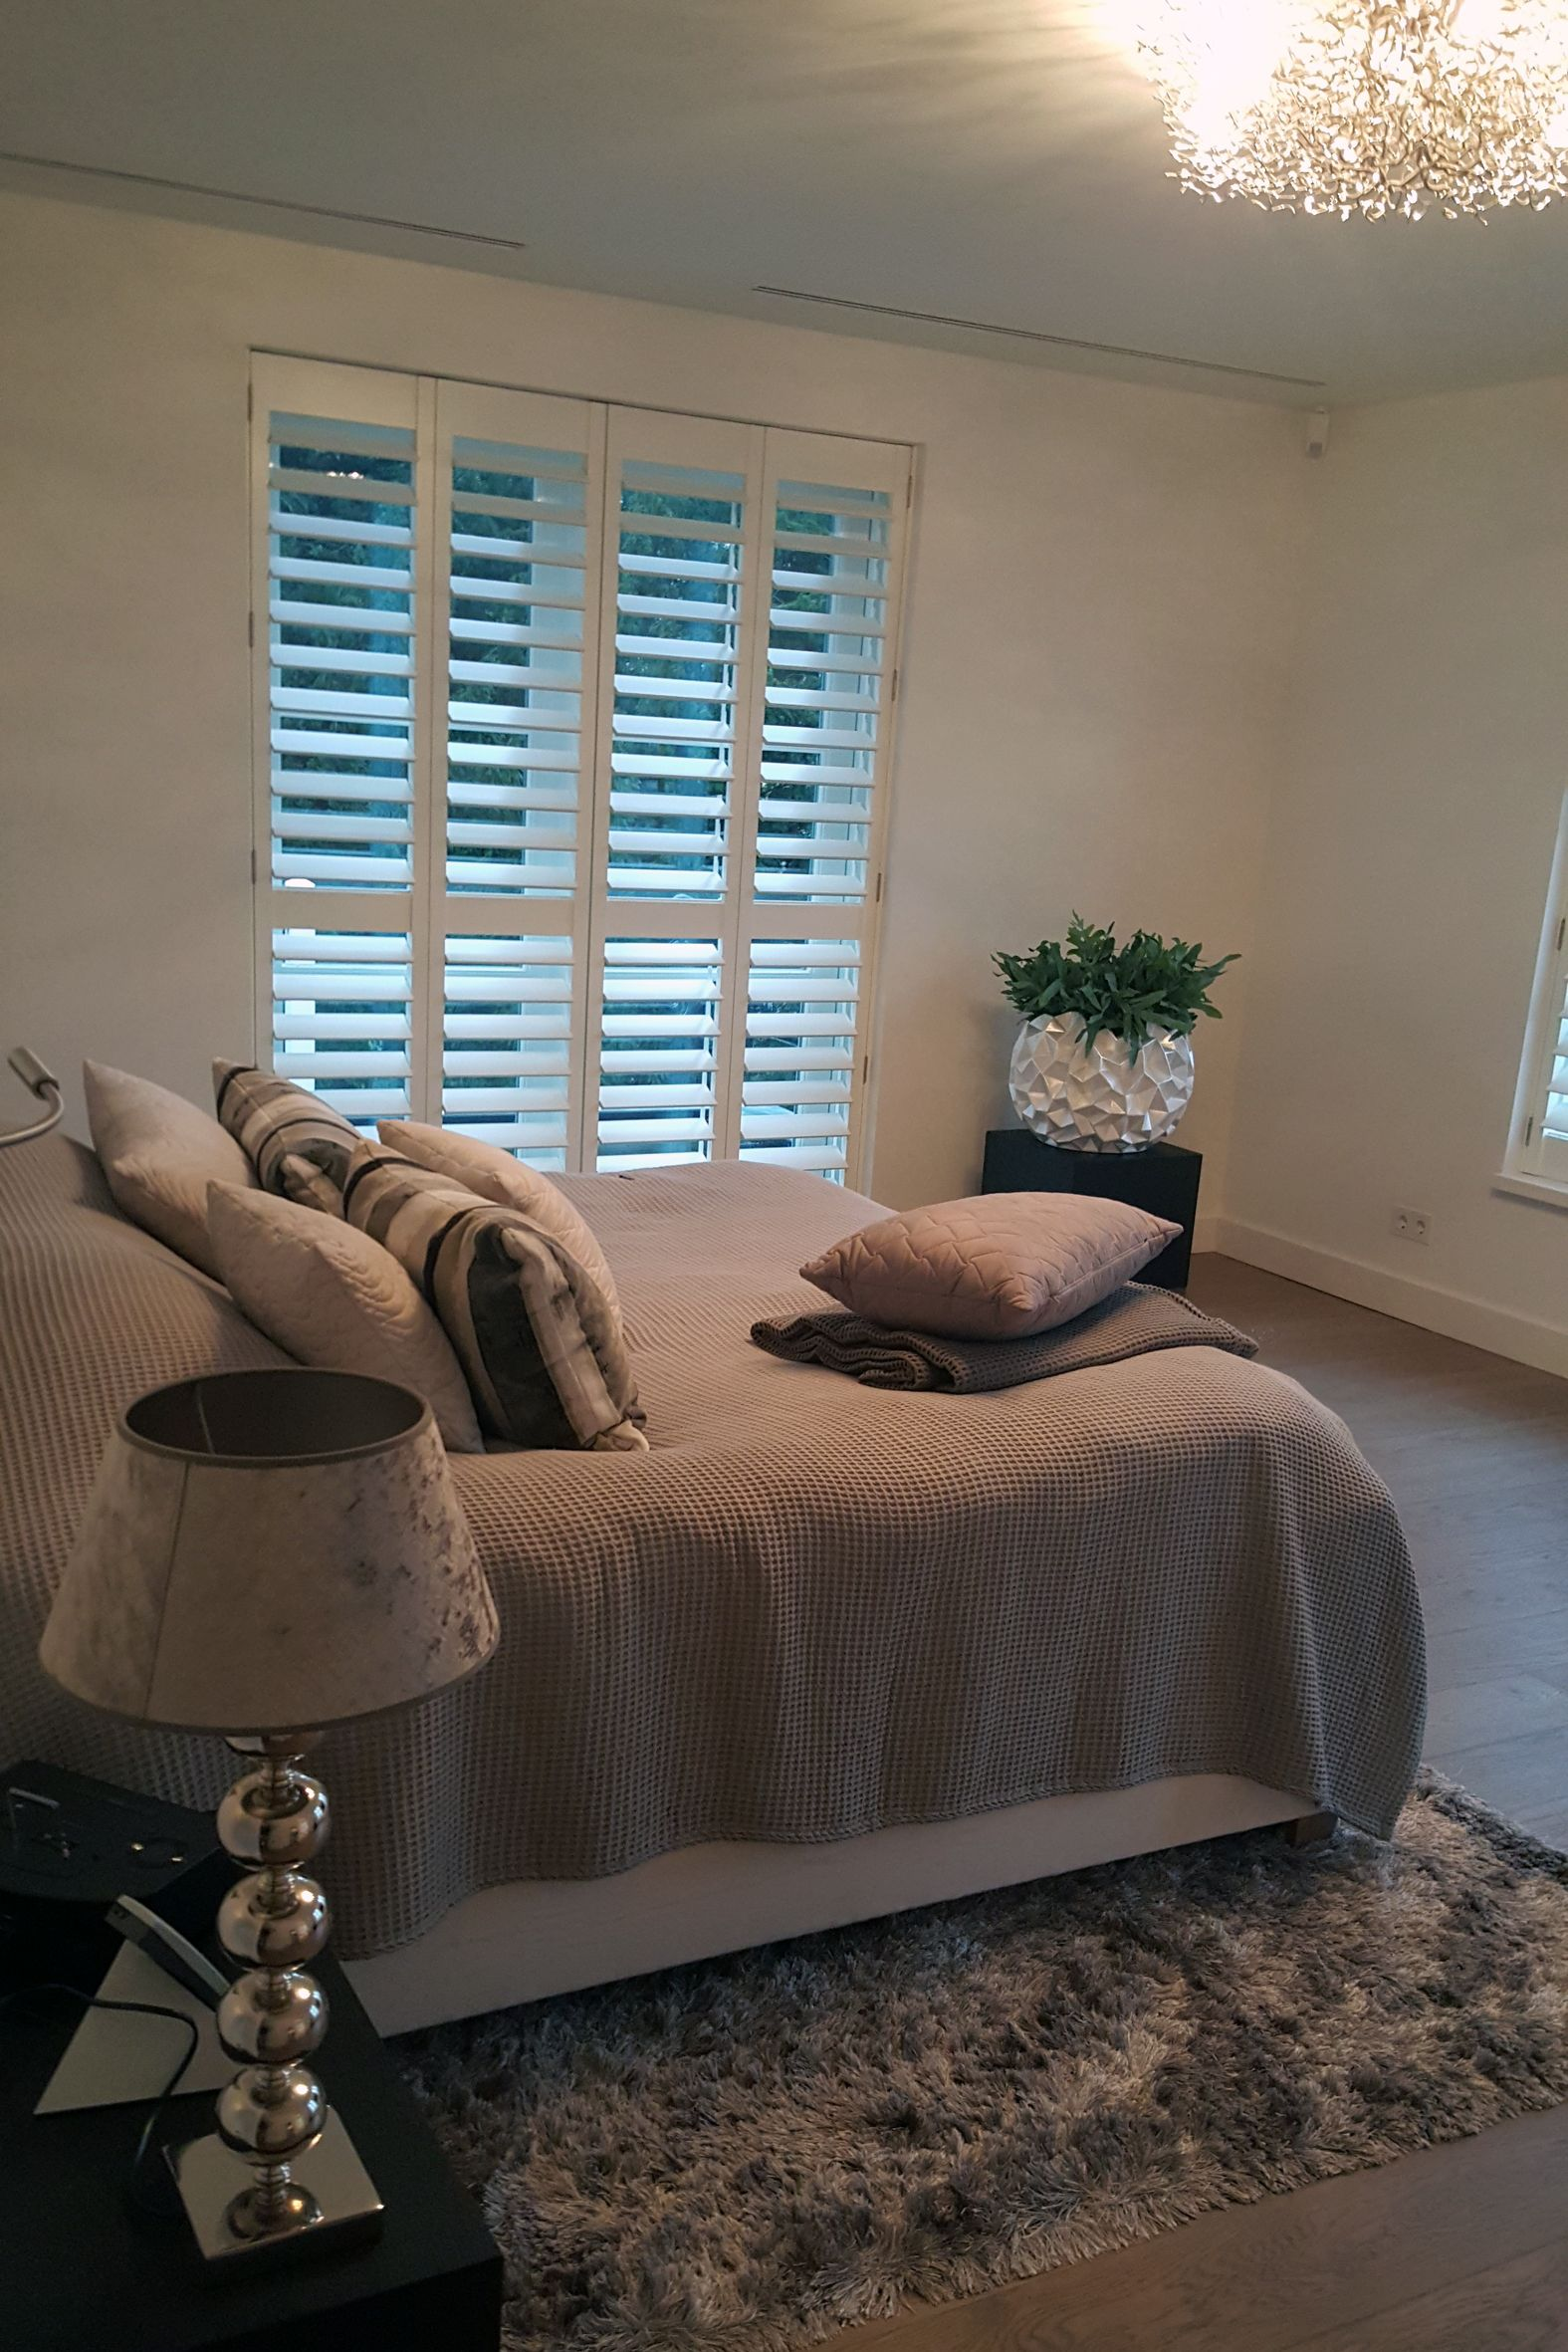 Design shutters op een mooie slaapkamer | Shutters | Pinterest